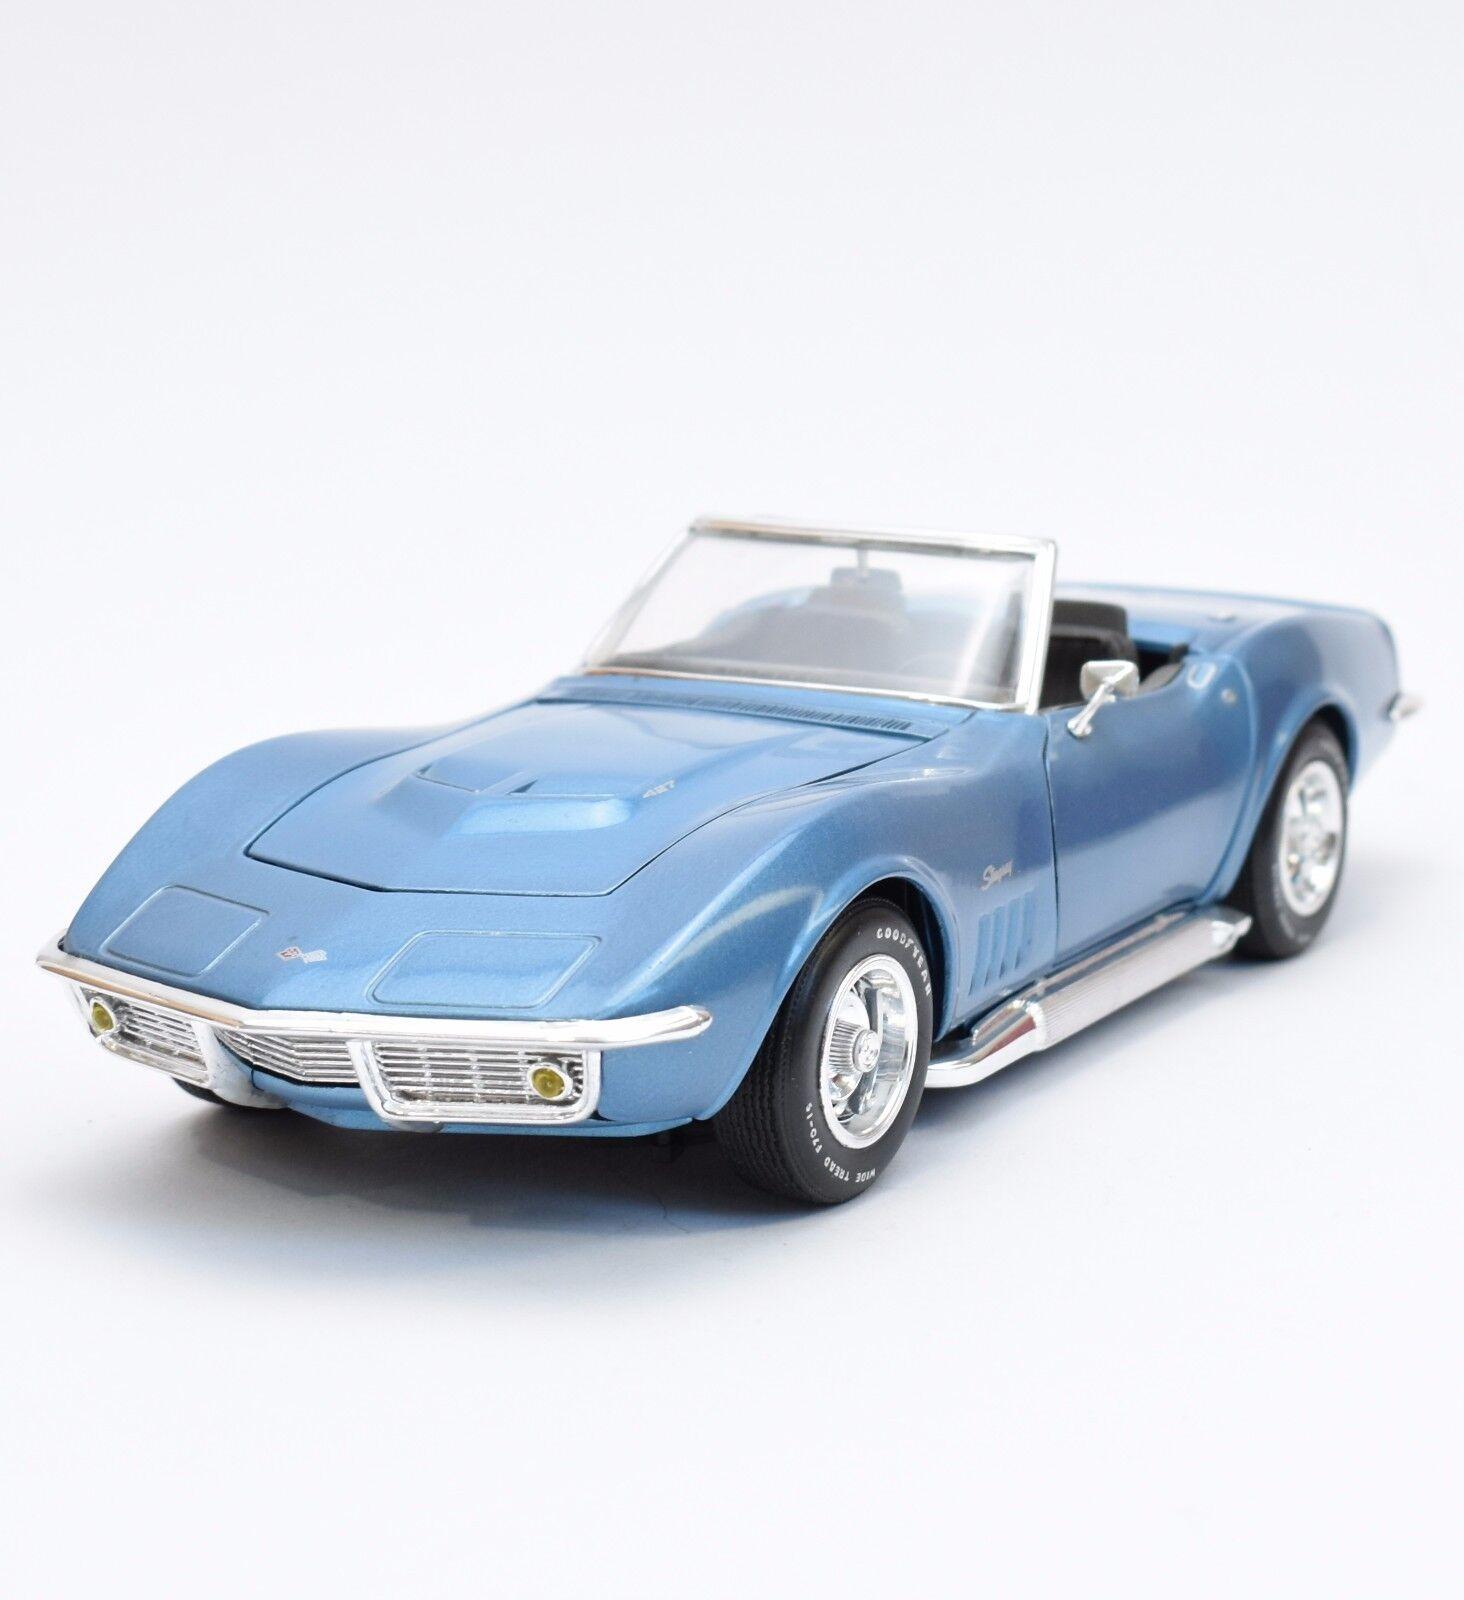 ahorra hasta un 80% Revell Revell Revell 8819 Corvette converdeible 69 auto deportivo en azul lacado, 1 18, embalaje original, k031  alta calidad